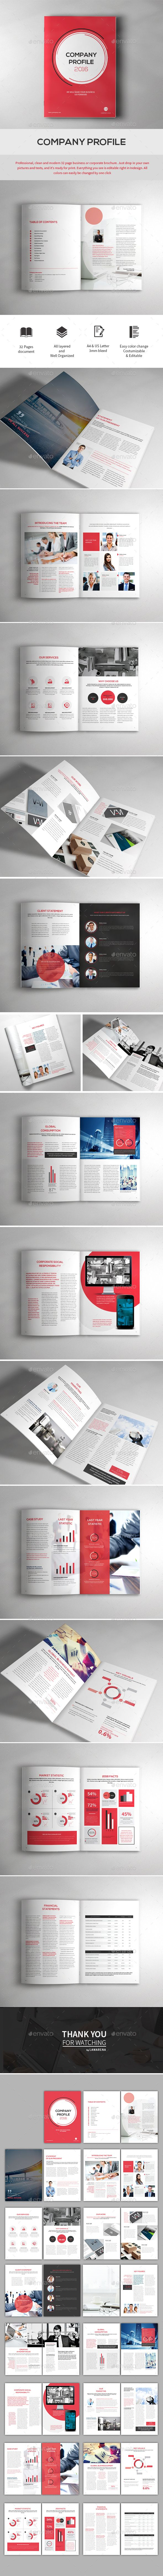 Company profile company profile indesign templates and brochures company profile indesign templatesbrochure pronofoot35fo Gallery